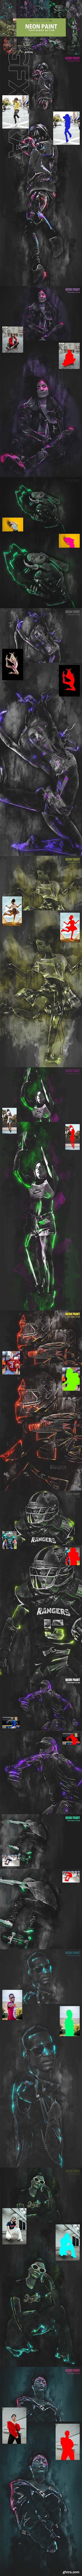 CreativeMarket - Neon Paint Photoshop Action 3397698